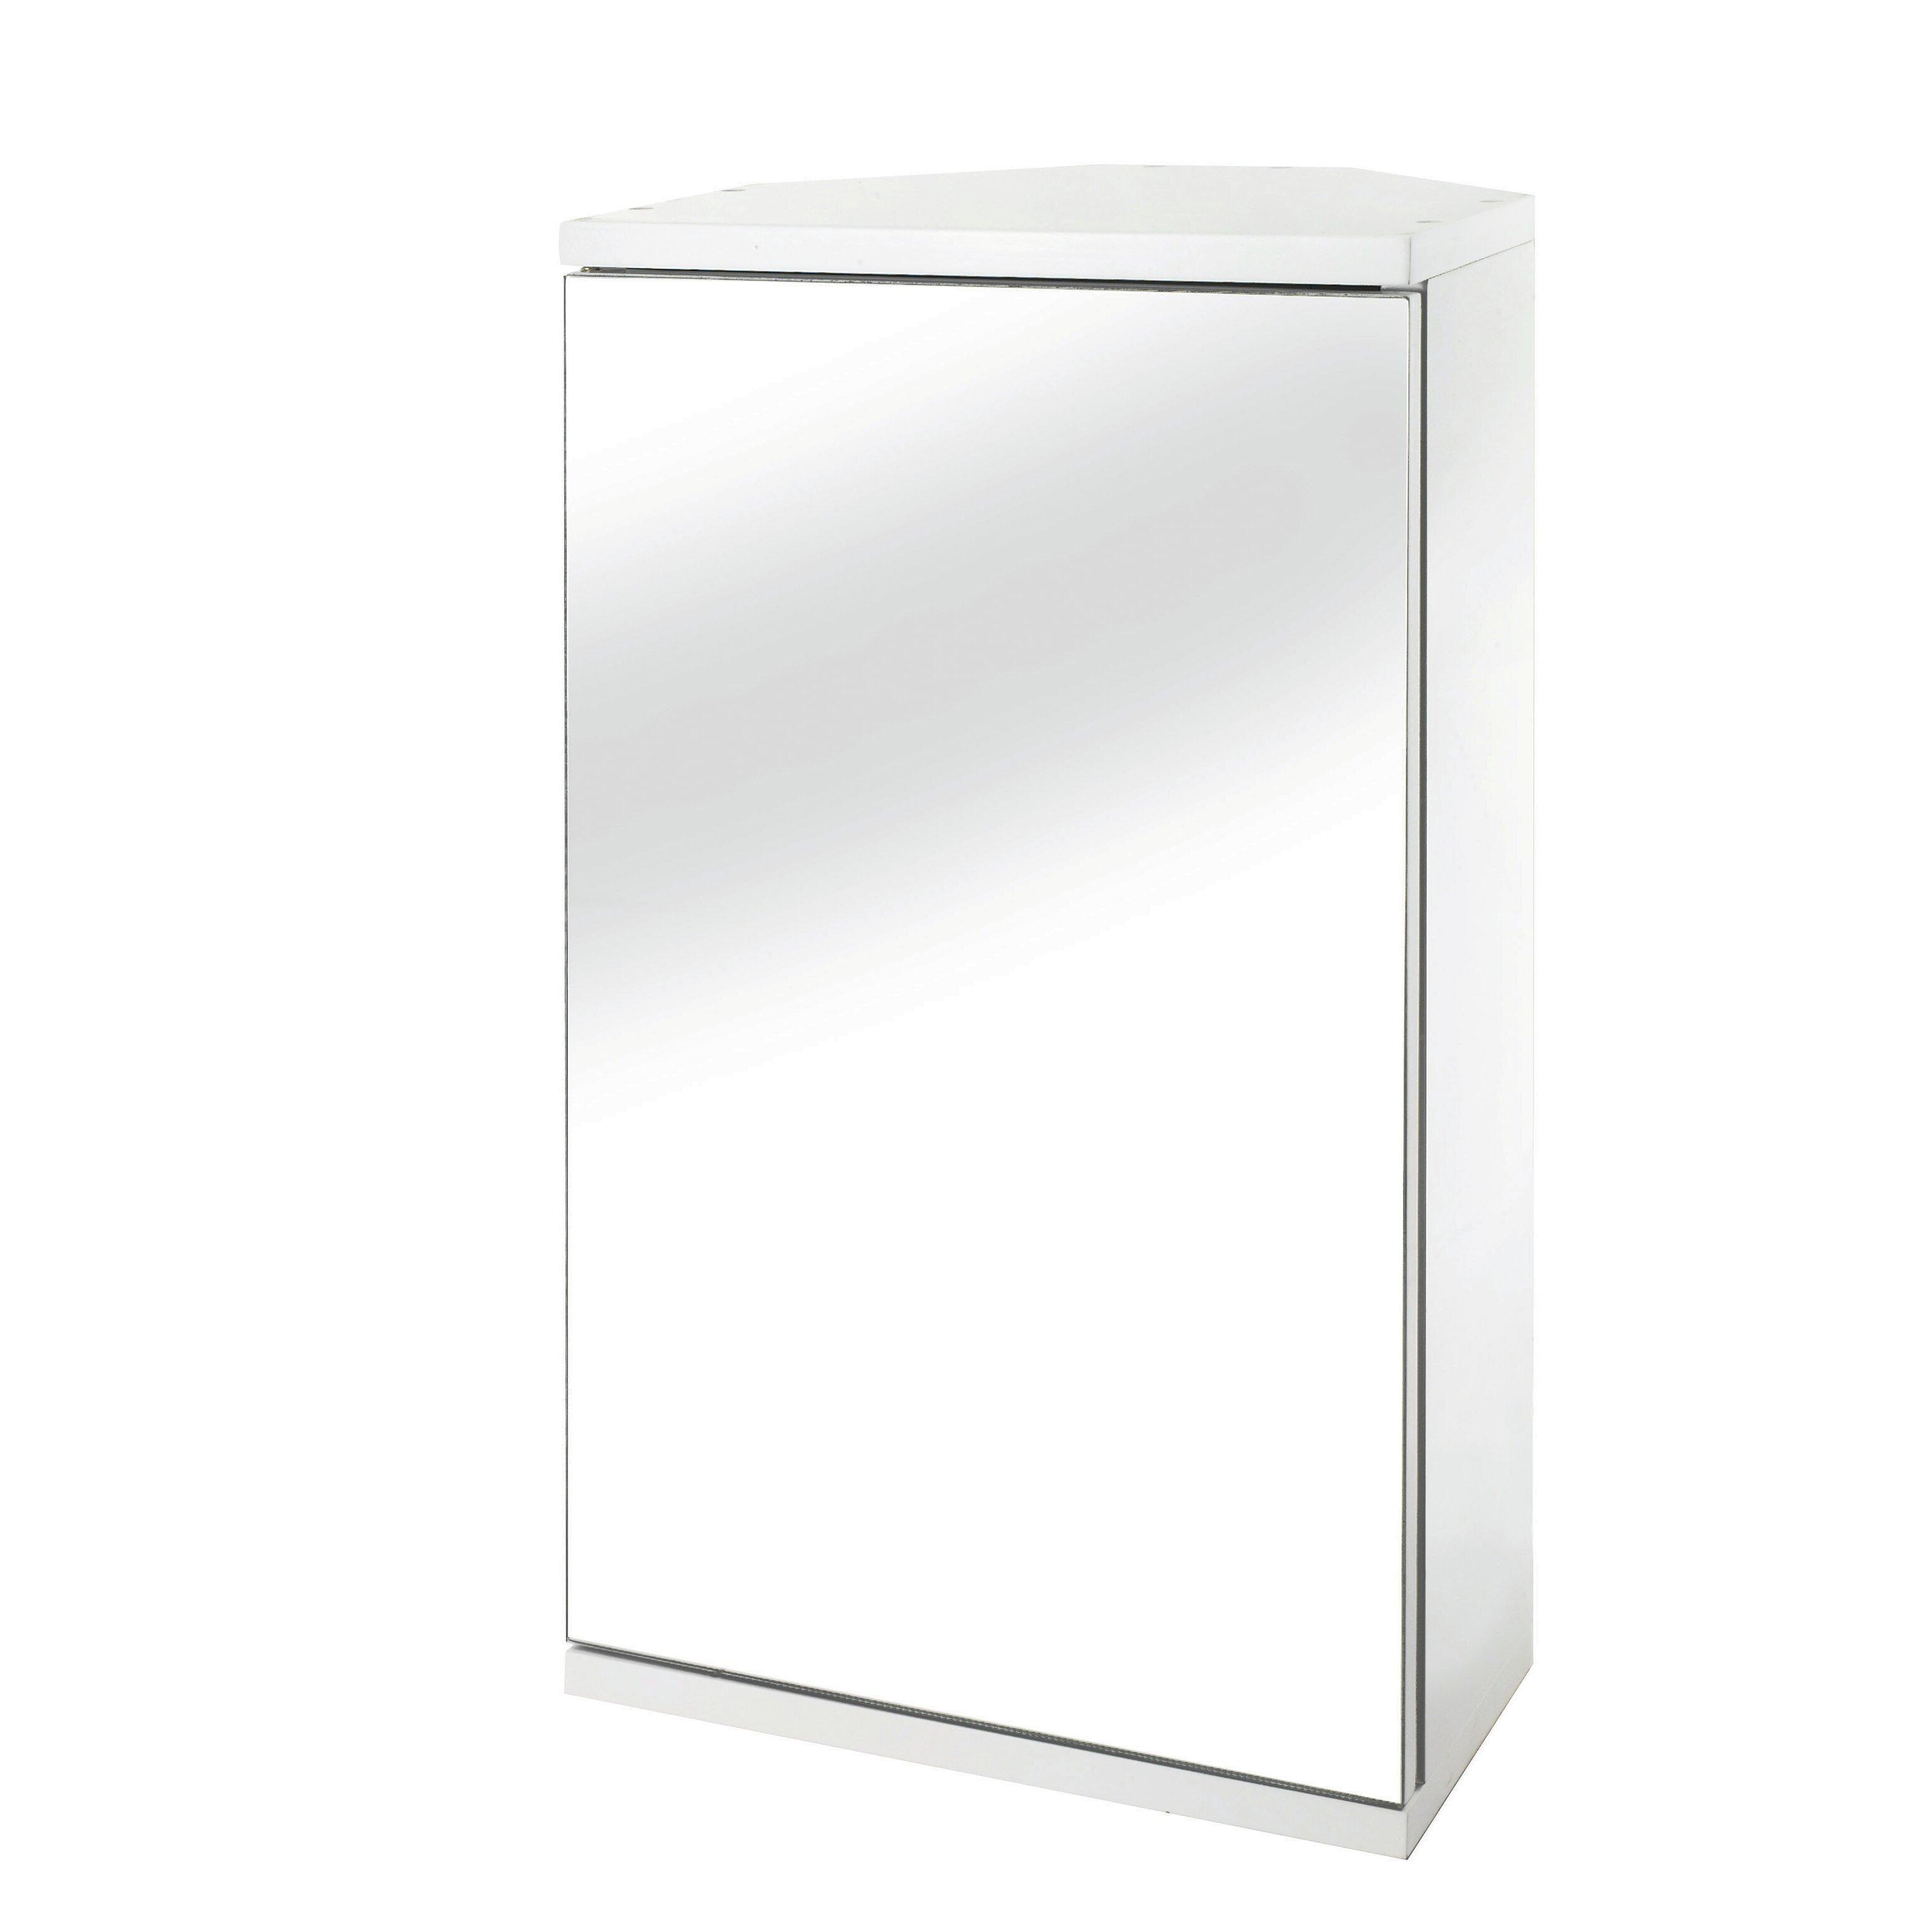 Simplicity 30cm x 50cm corner mount mirror cabinet for Miroir 30 x 50